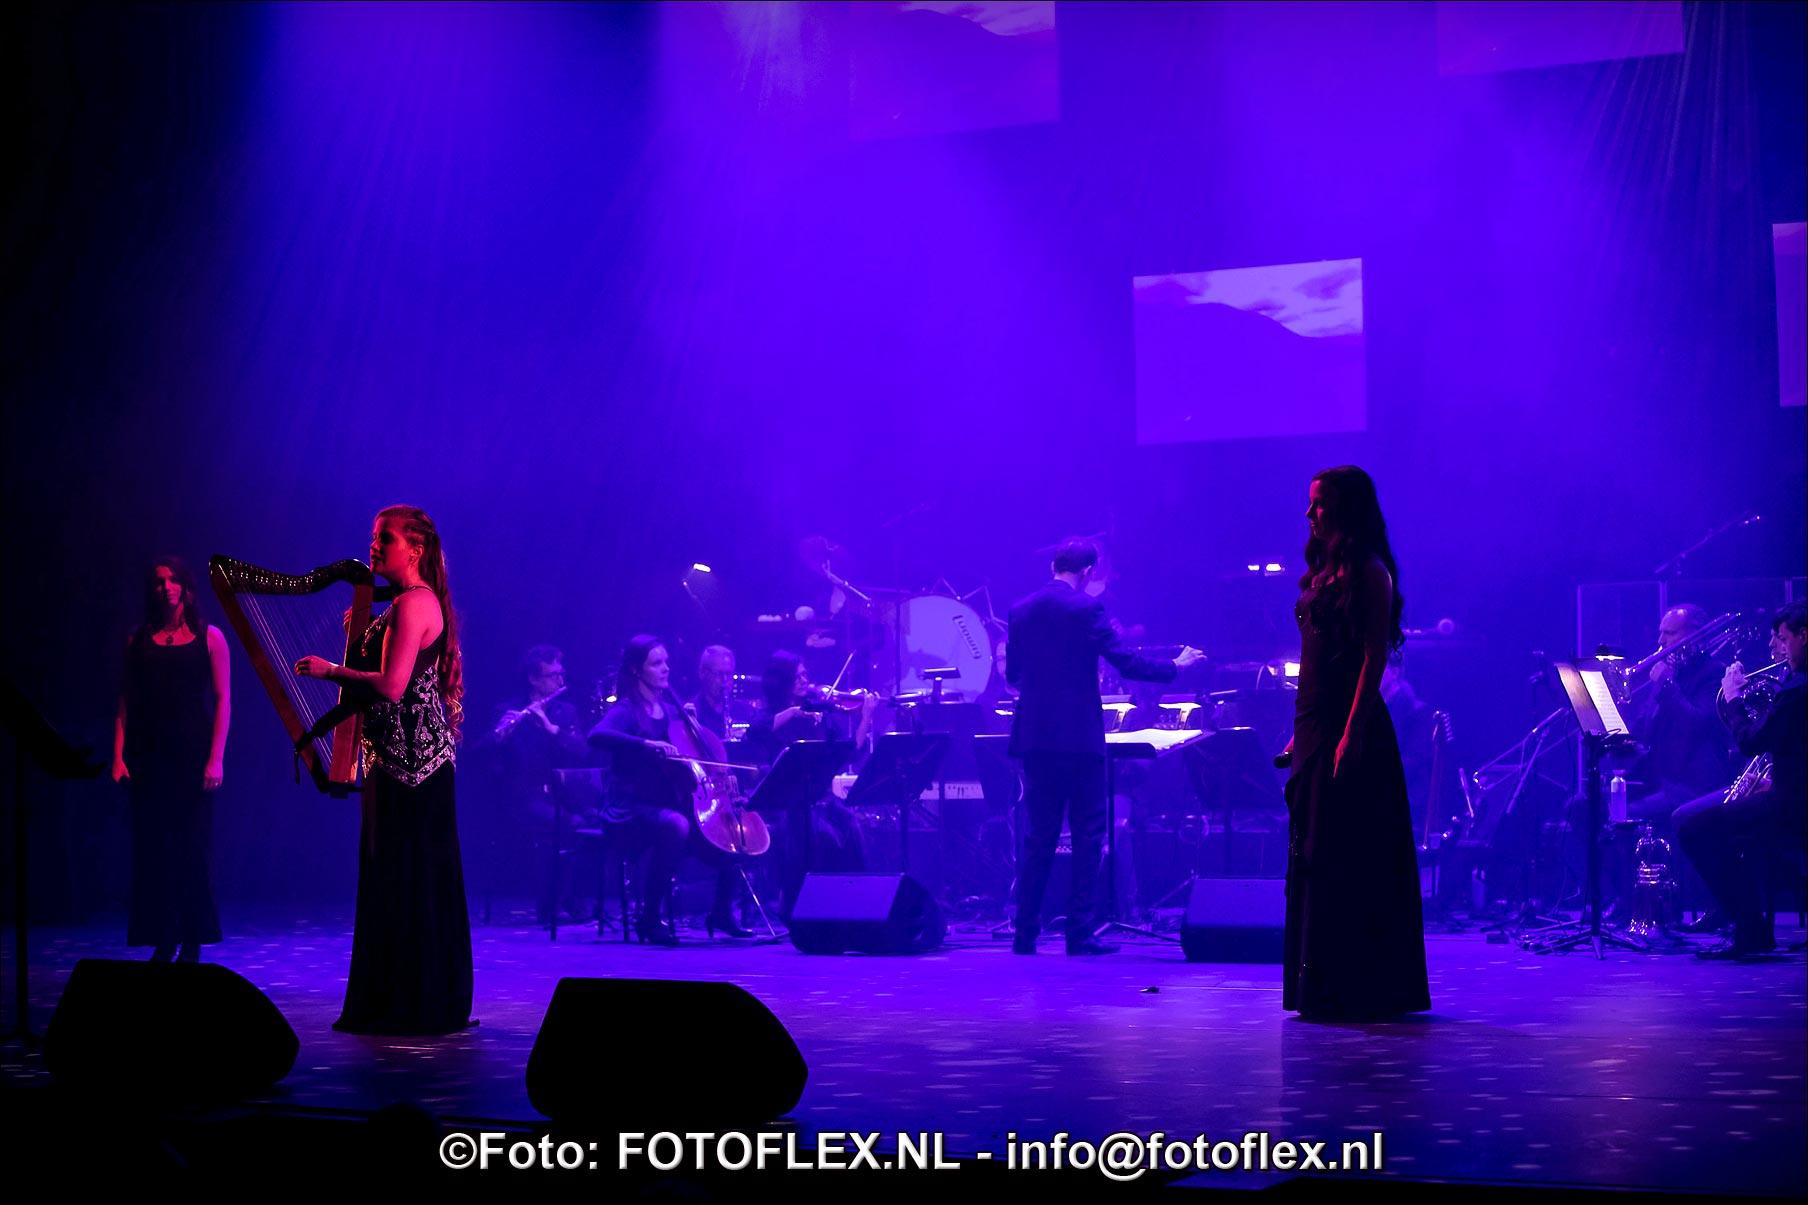 0361-CopyrightFOTOFLEX.NL07012020